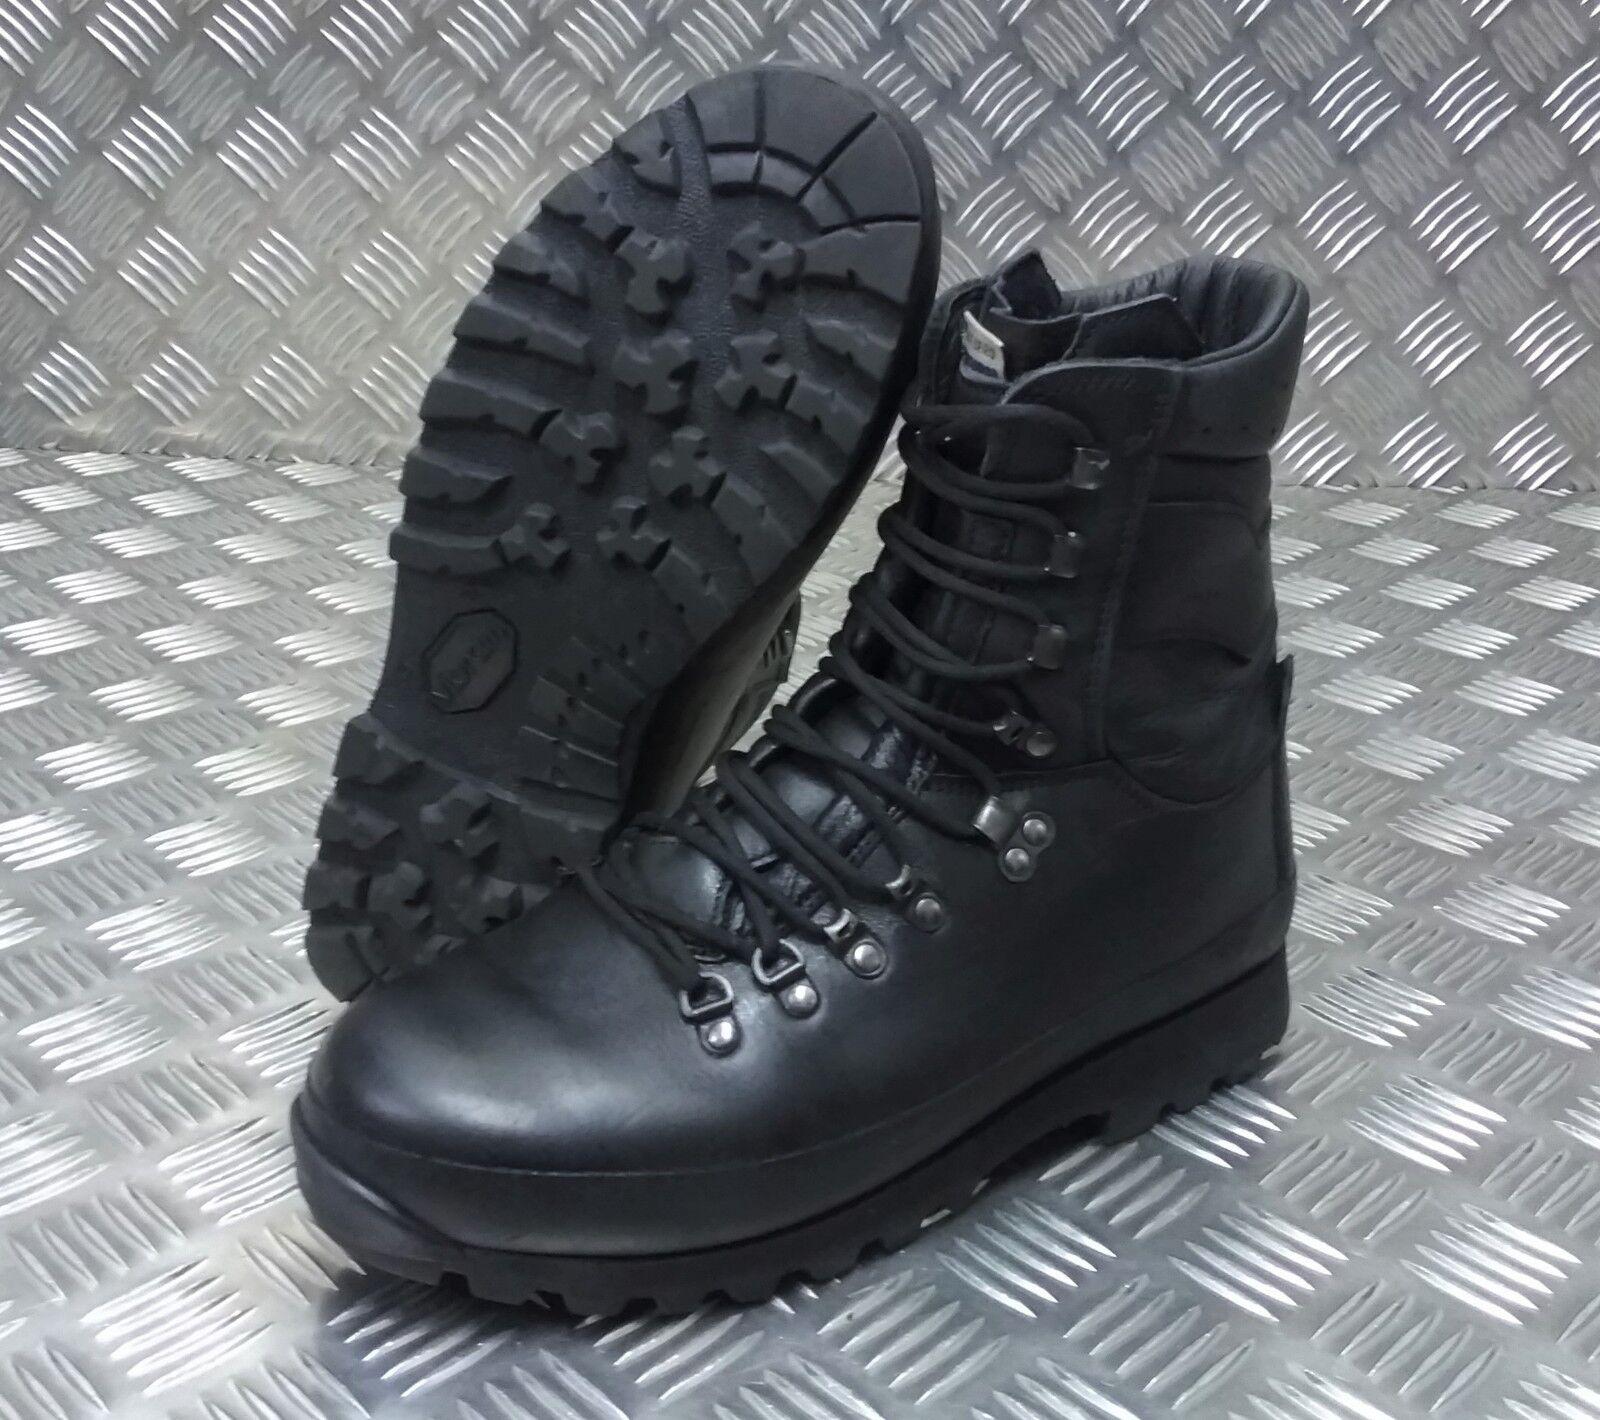 Genuine British Army Alt-Berg Combat Leather Assault   Patrol Combat Boots BLK